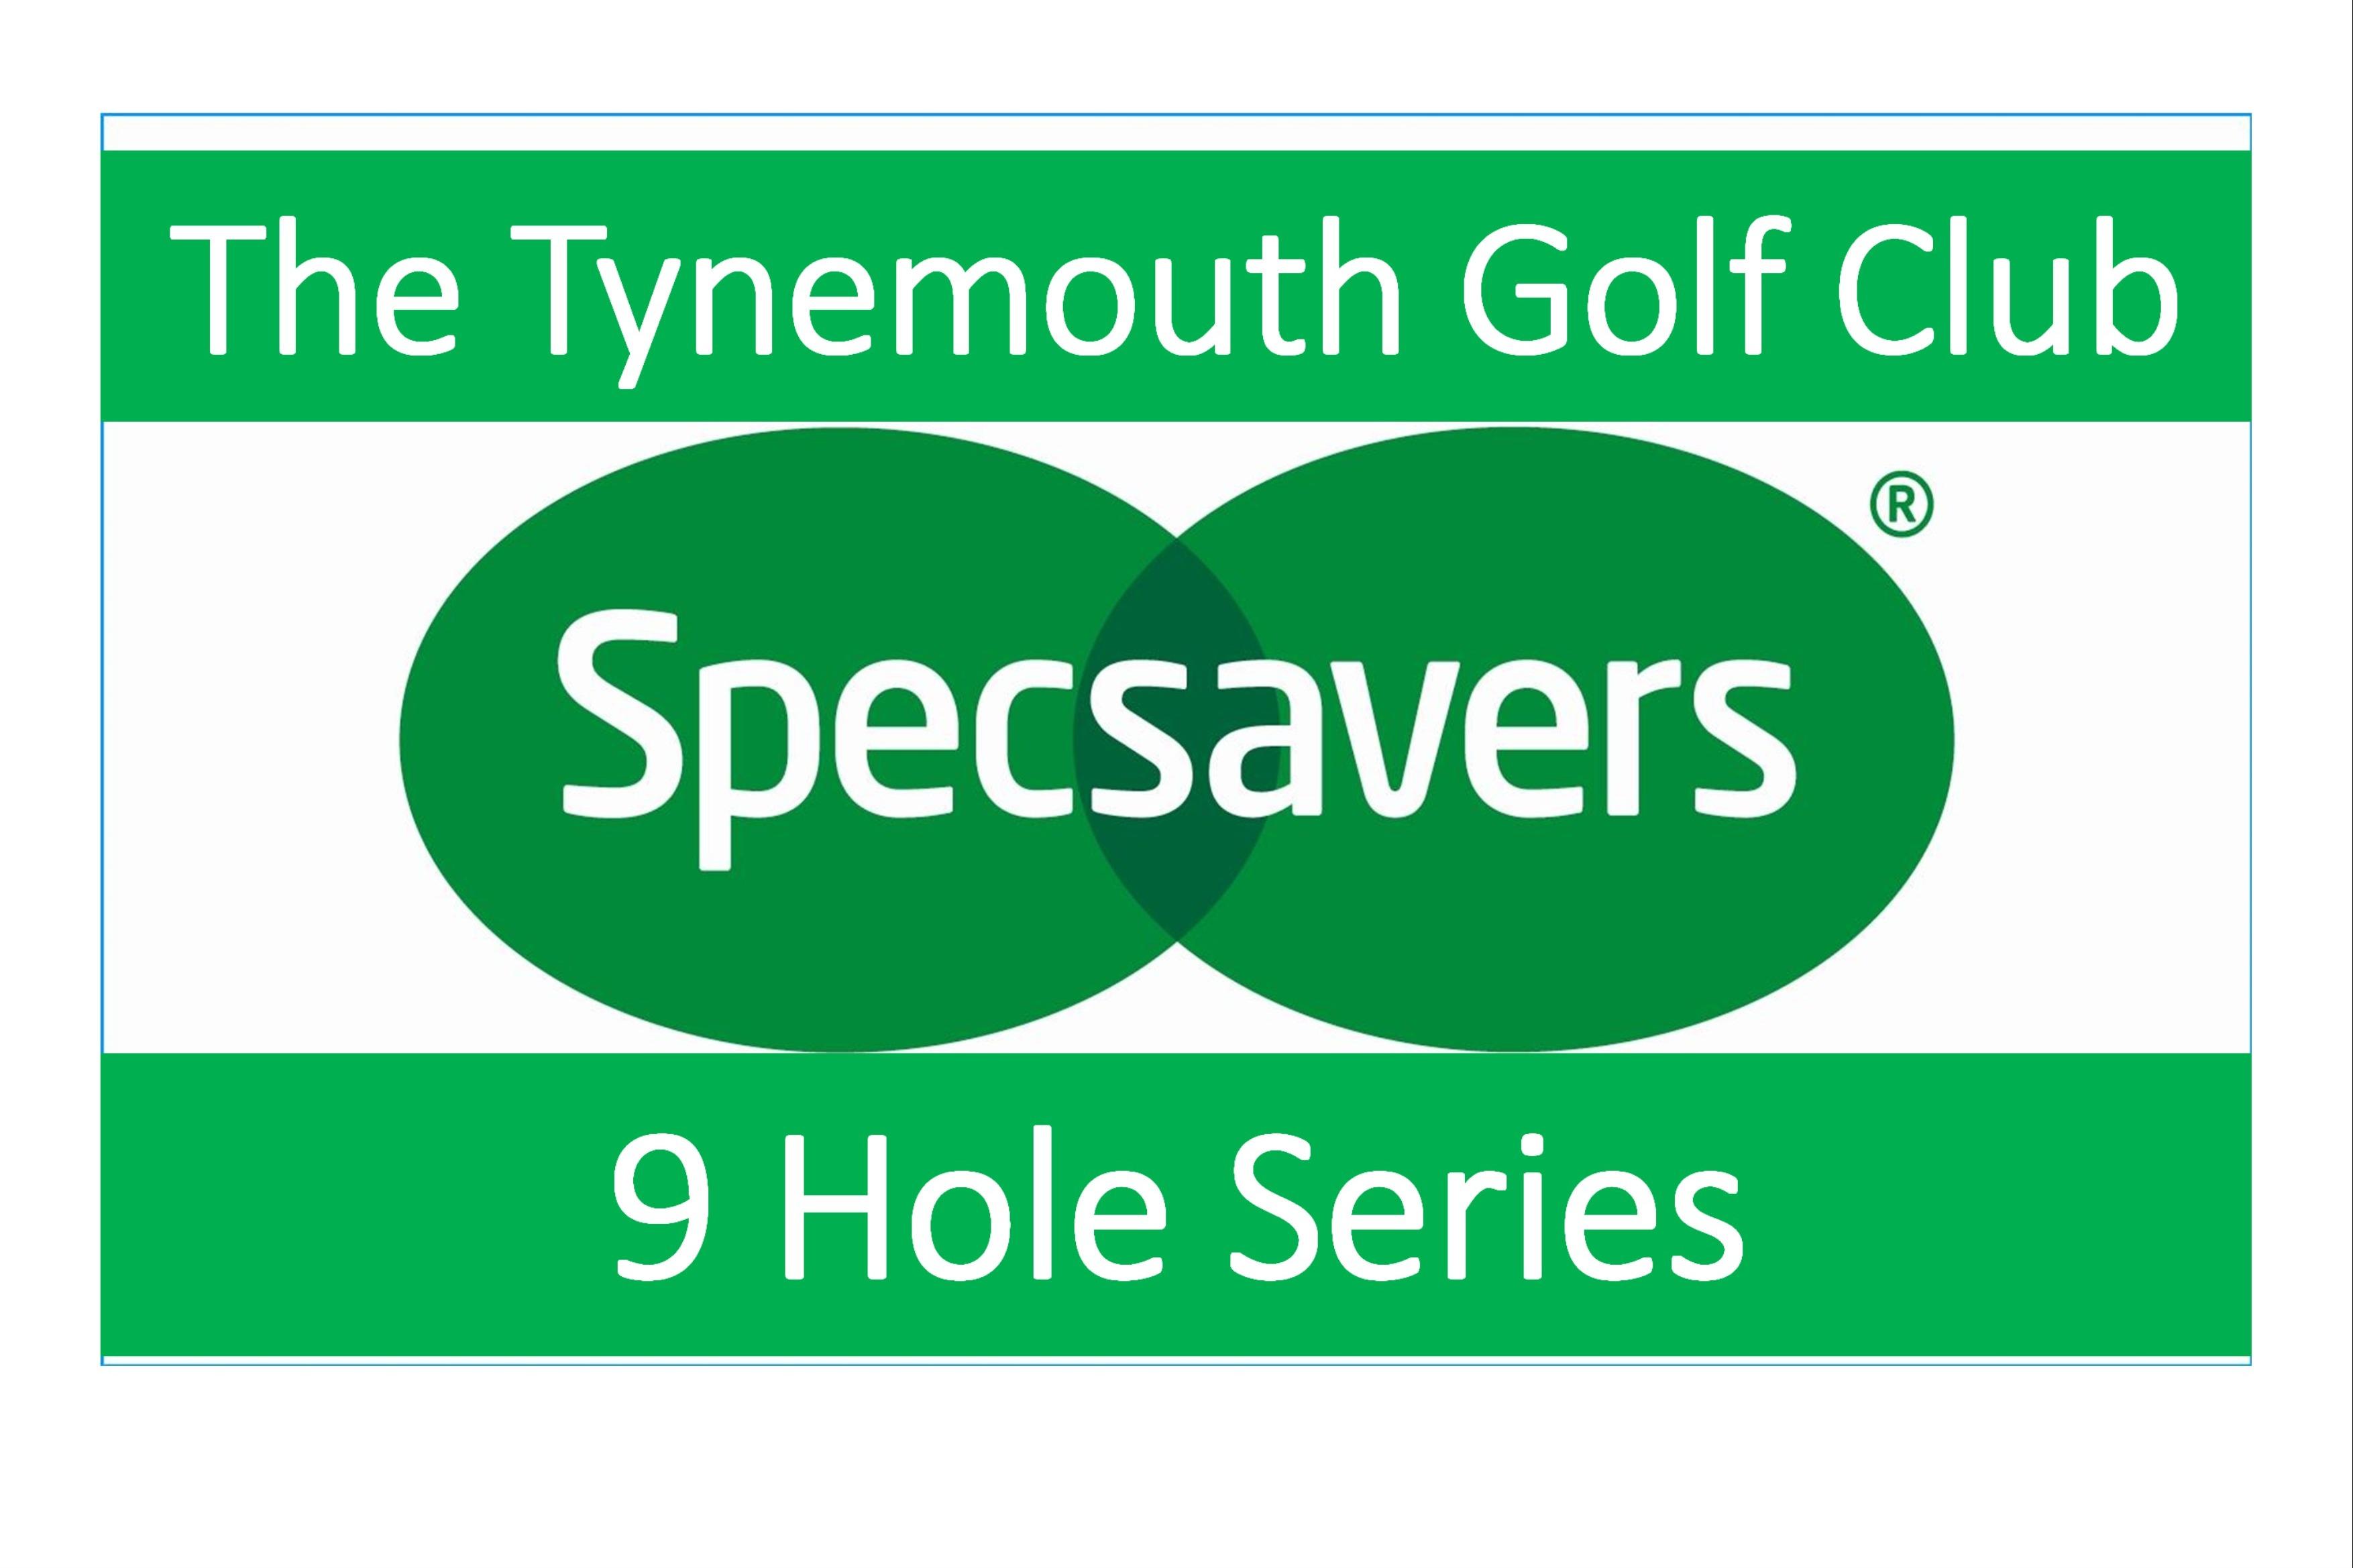 The TGC 9 Hole Series